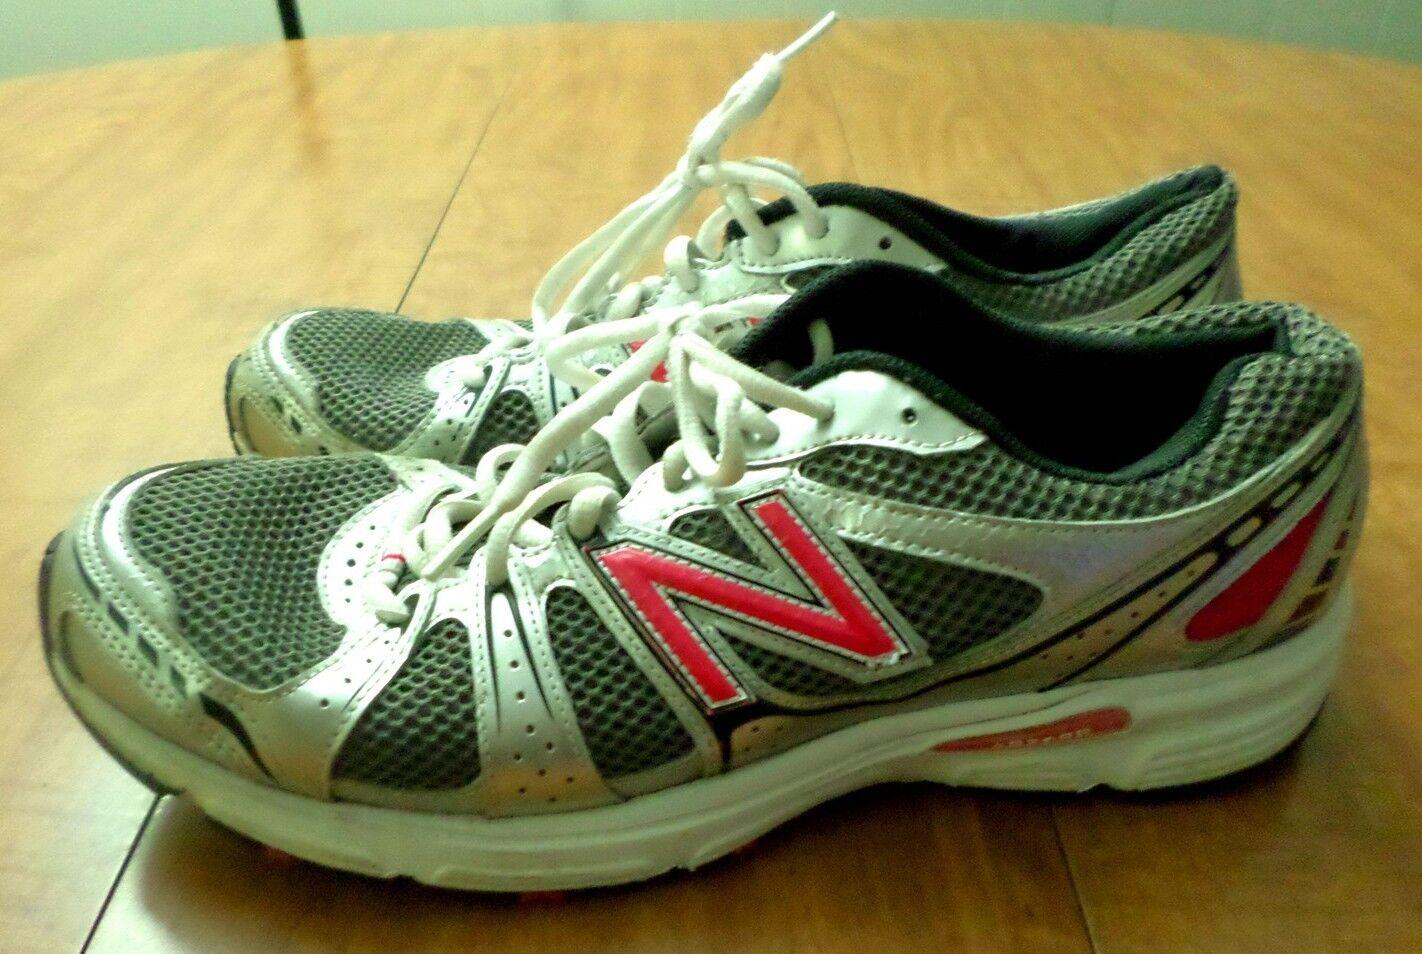 NEW BALANCE women's size 11 tennis shoes running 480 pink & white